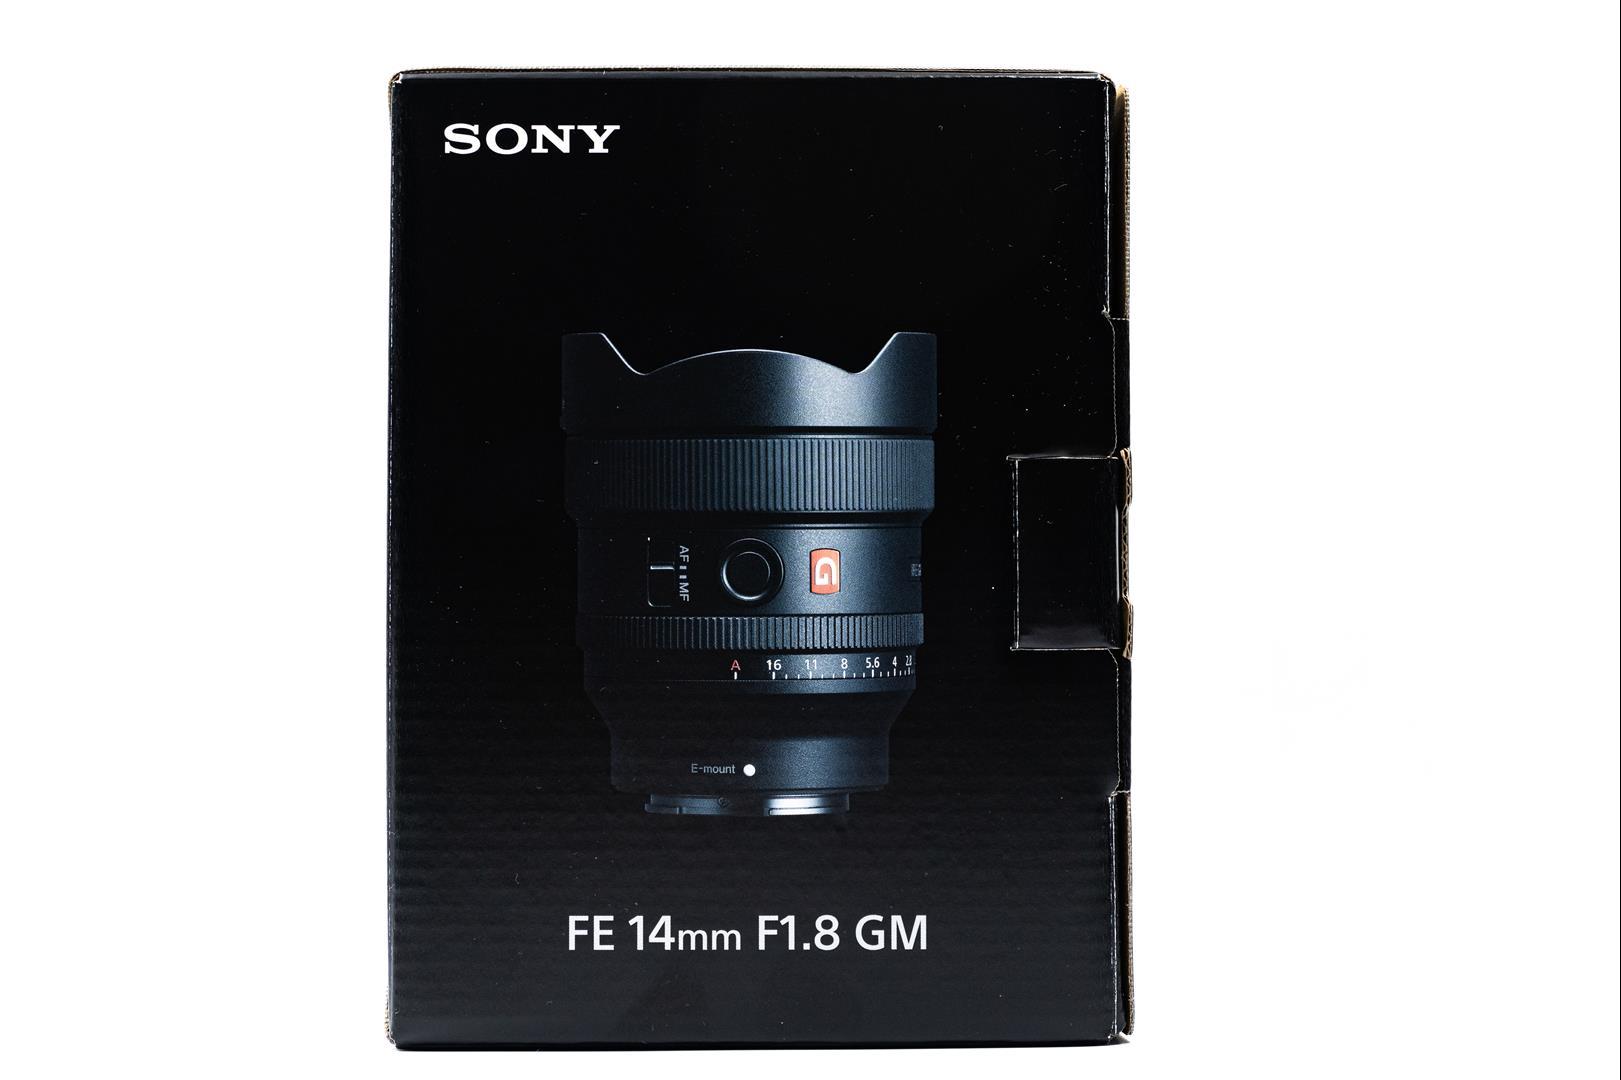 Sony FE 14mm F1.8 GM 開箱